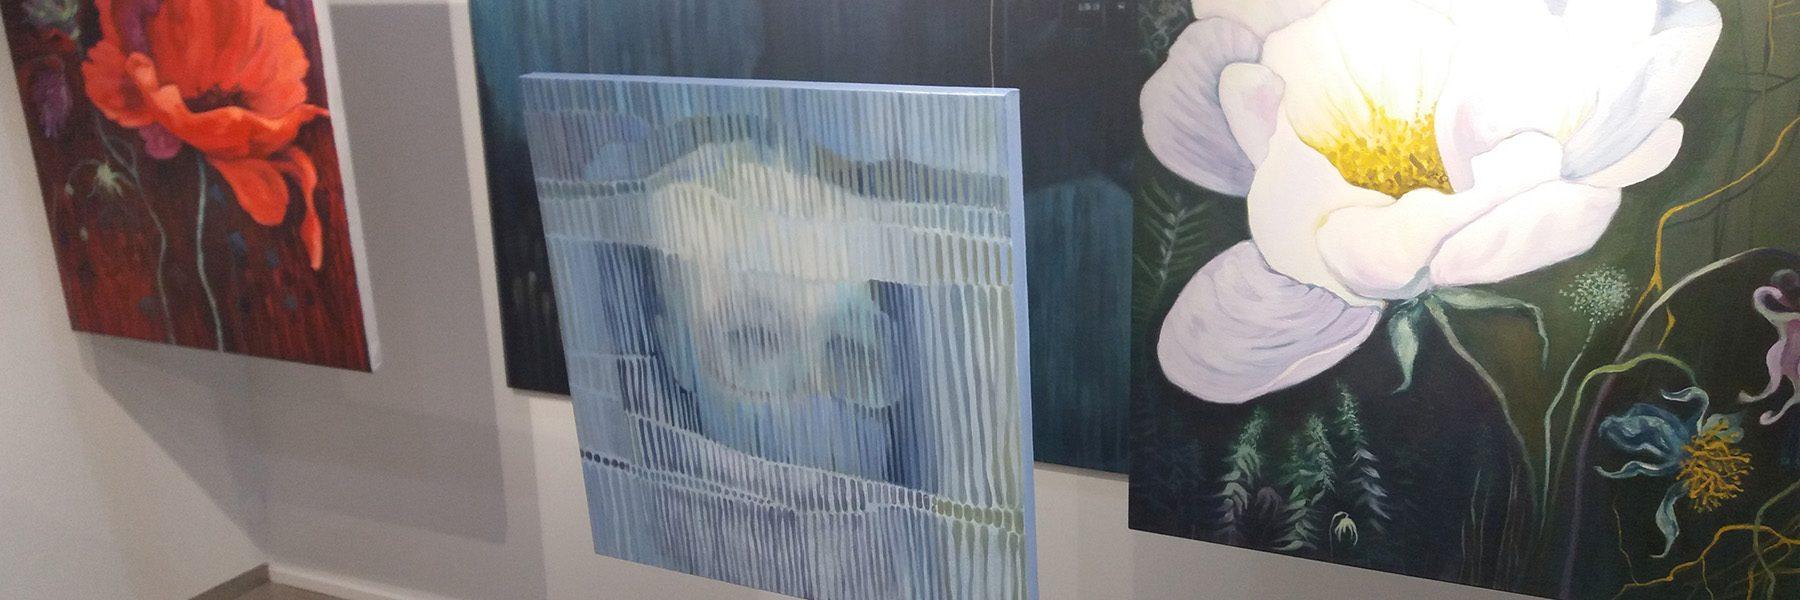 Galleria Sará näyttelykuva.